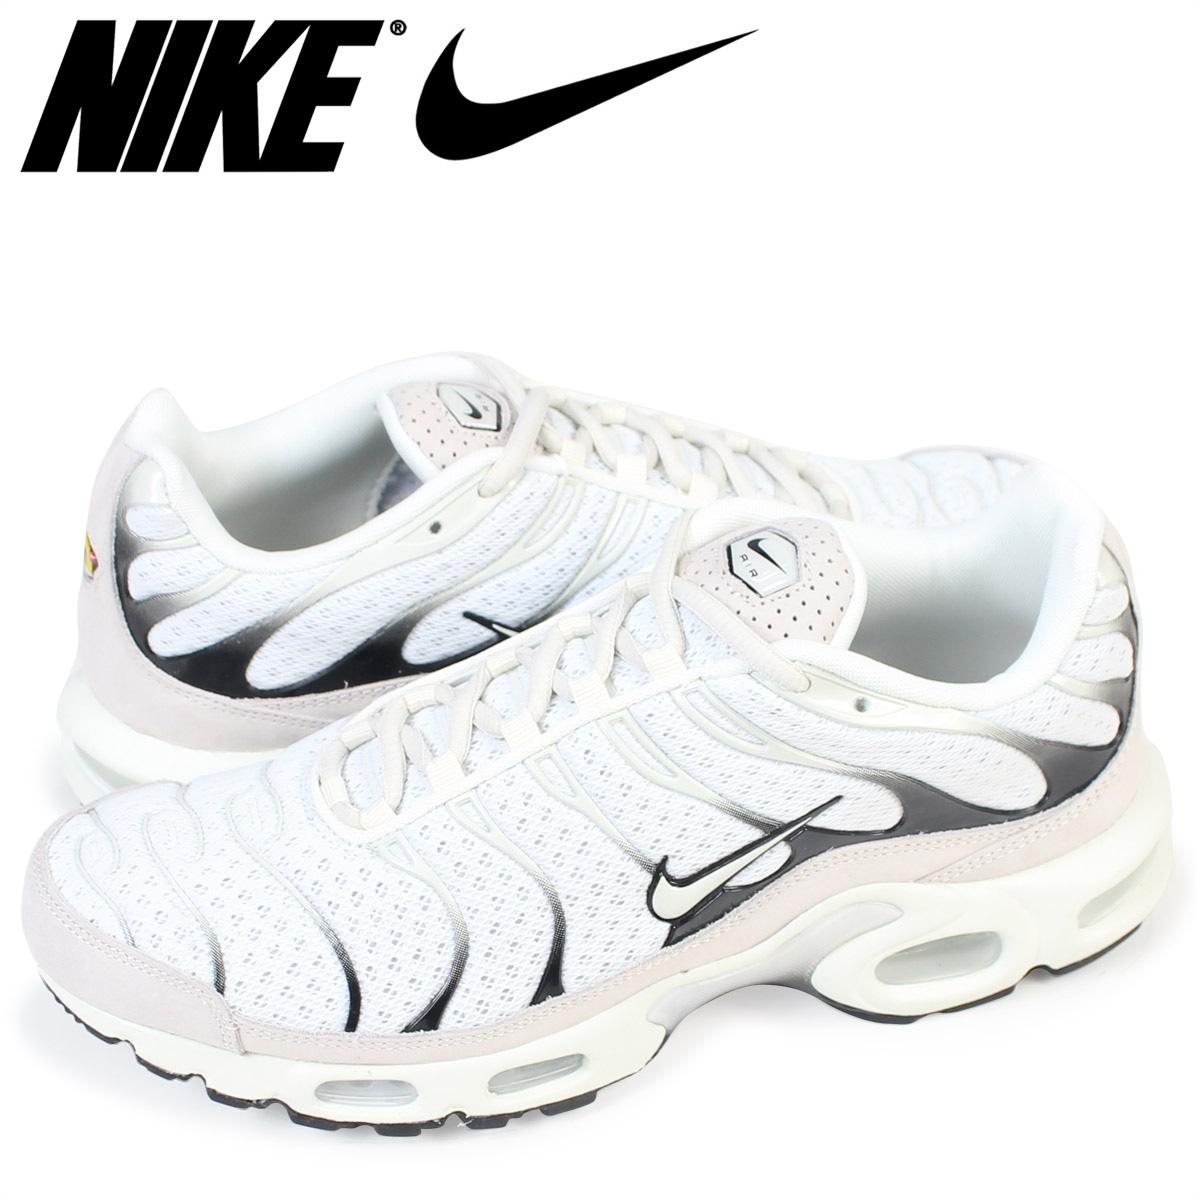 sale retailer abd77 57cc2 NIKE LAB Nike laboratory Air Max sneakers AIR MAX PLUS 898,018-100 men's  shoes white [9/6 Shinnyu load] [179]